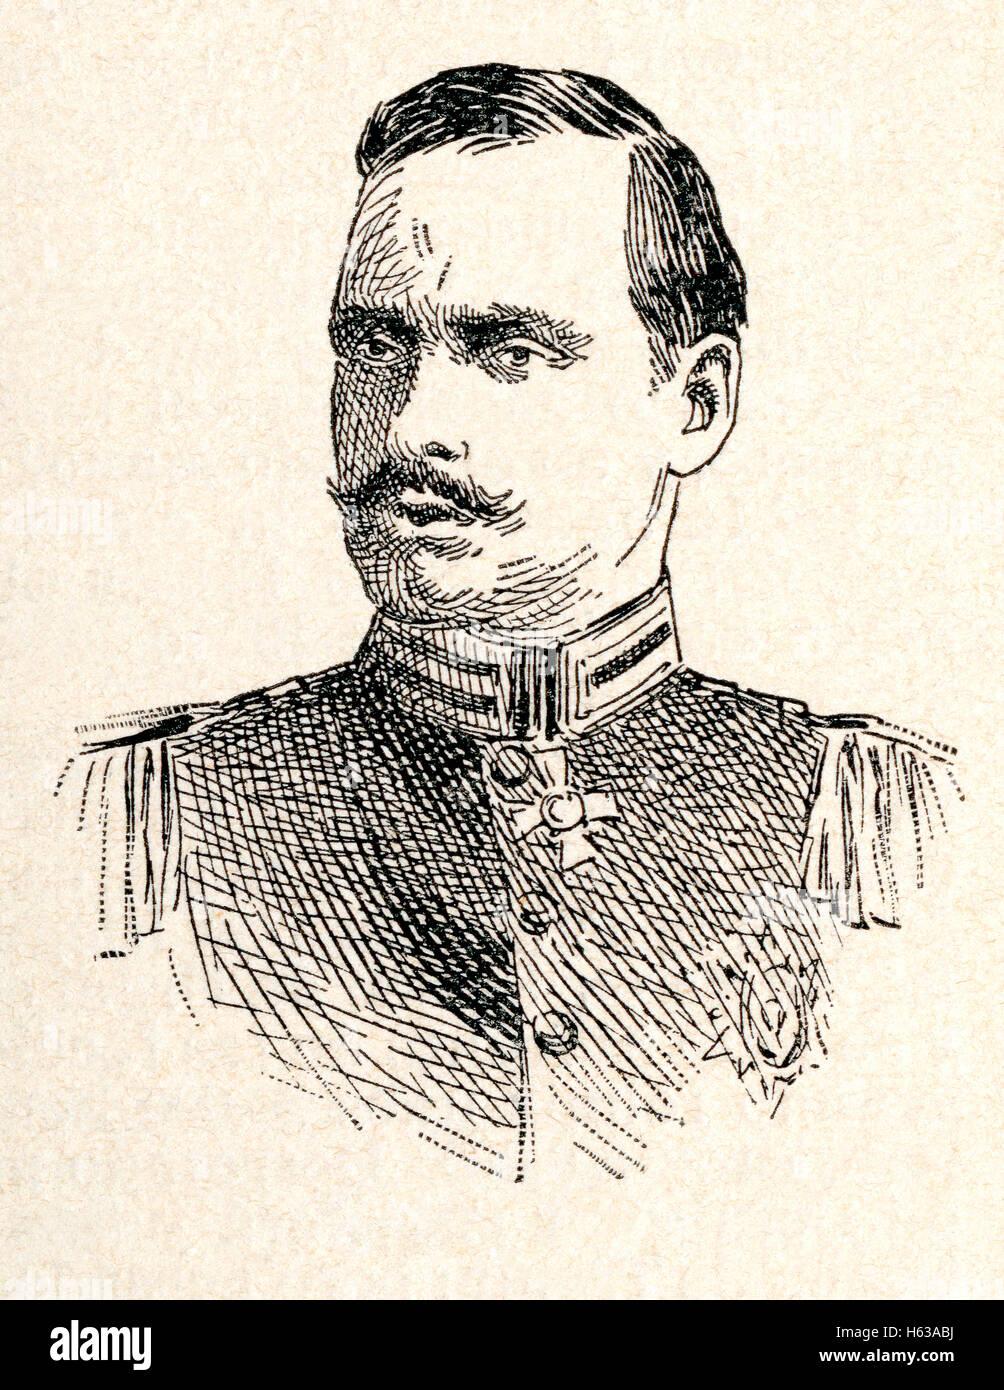 Ernest Louis Charles Albert William, nicknamed Ernie, 1868 – 1937.  Last Grand Duke of Hesse and by Rhine. Stock Photo